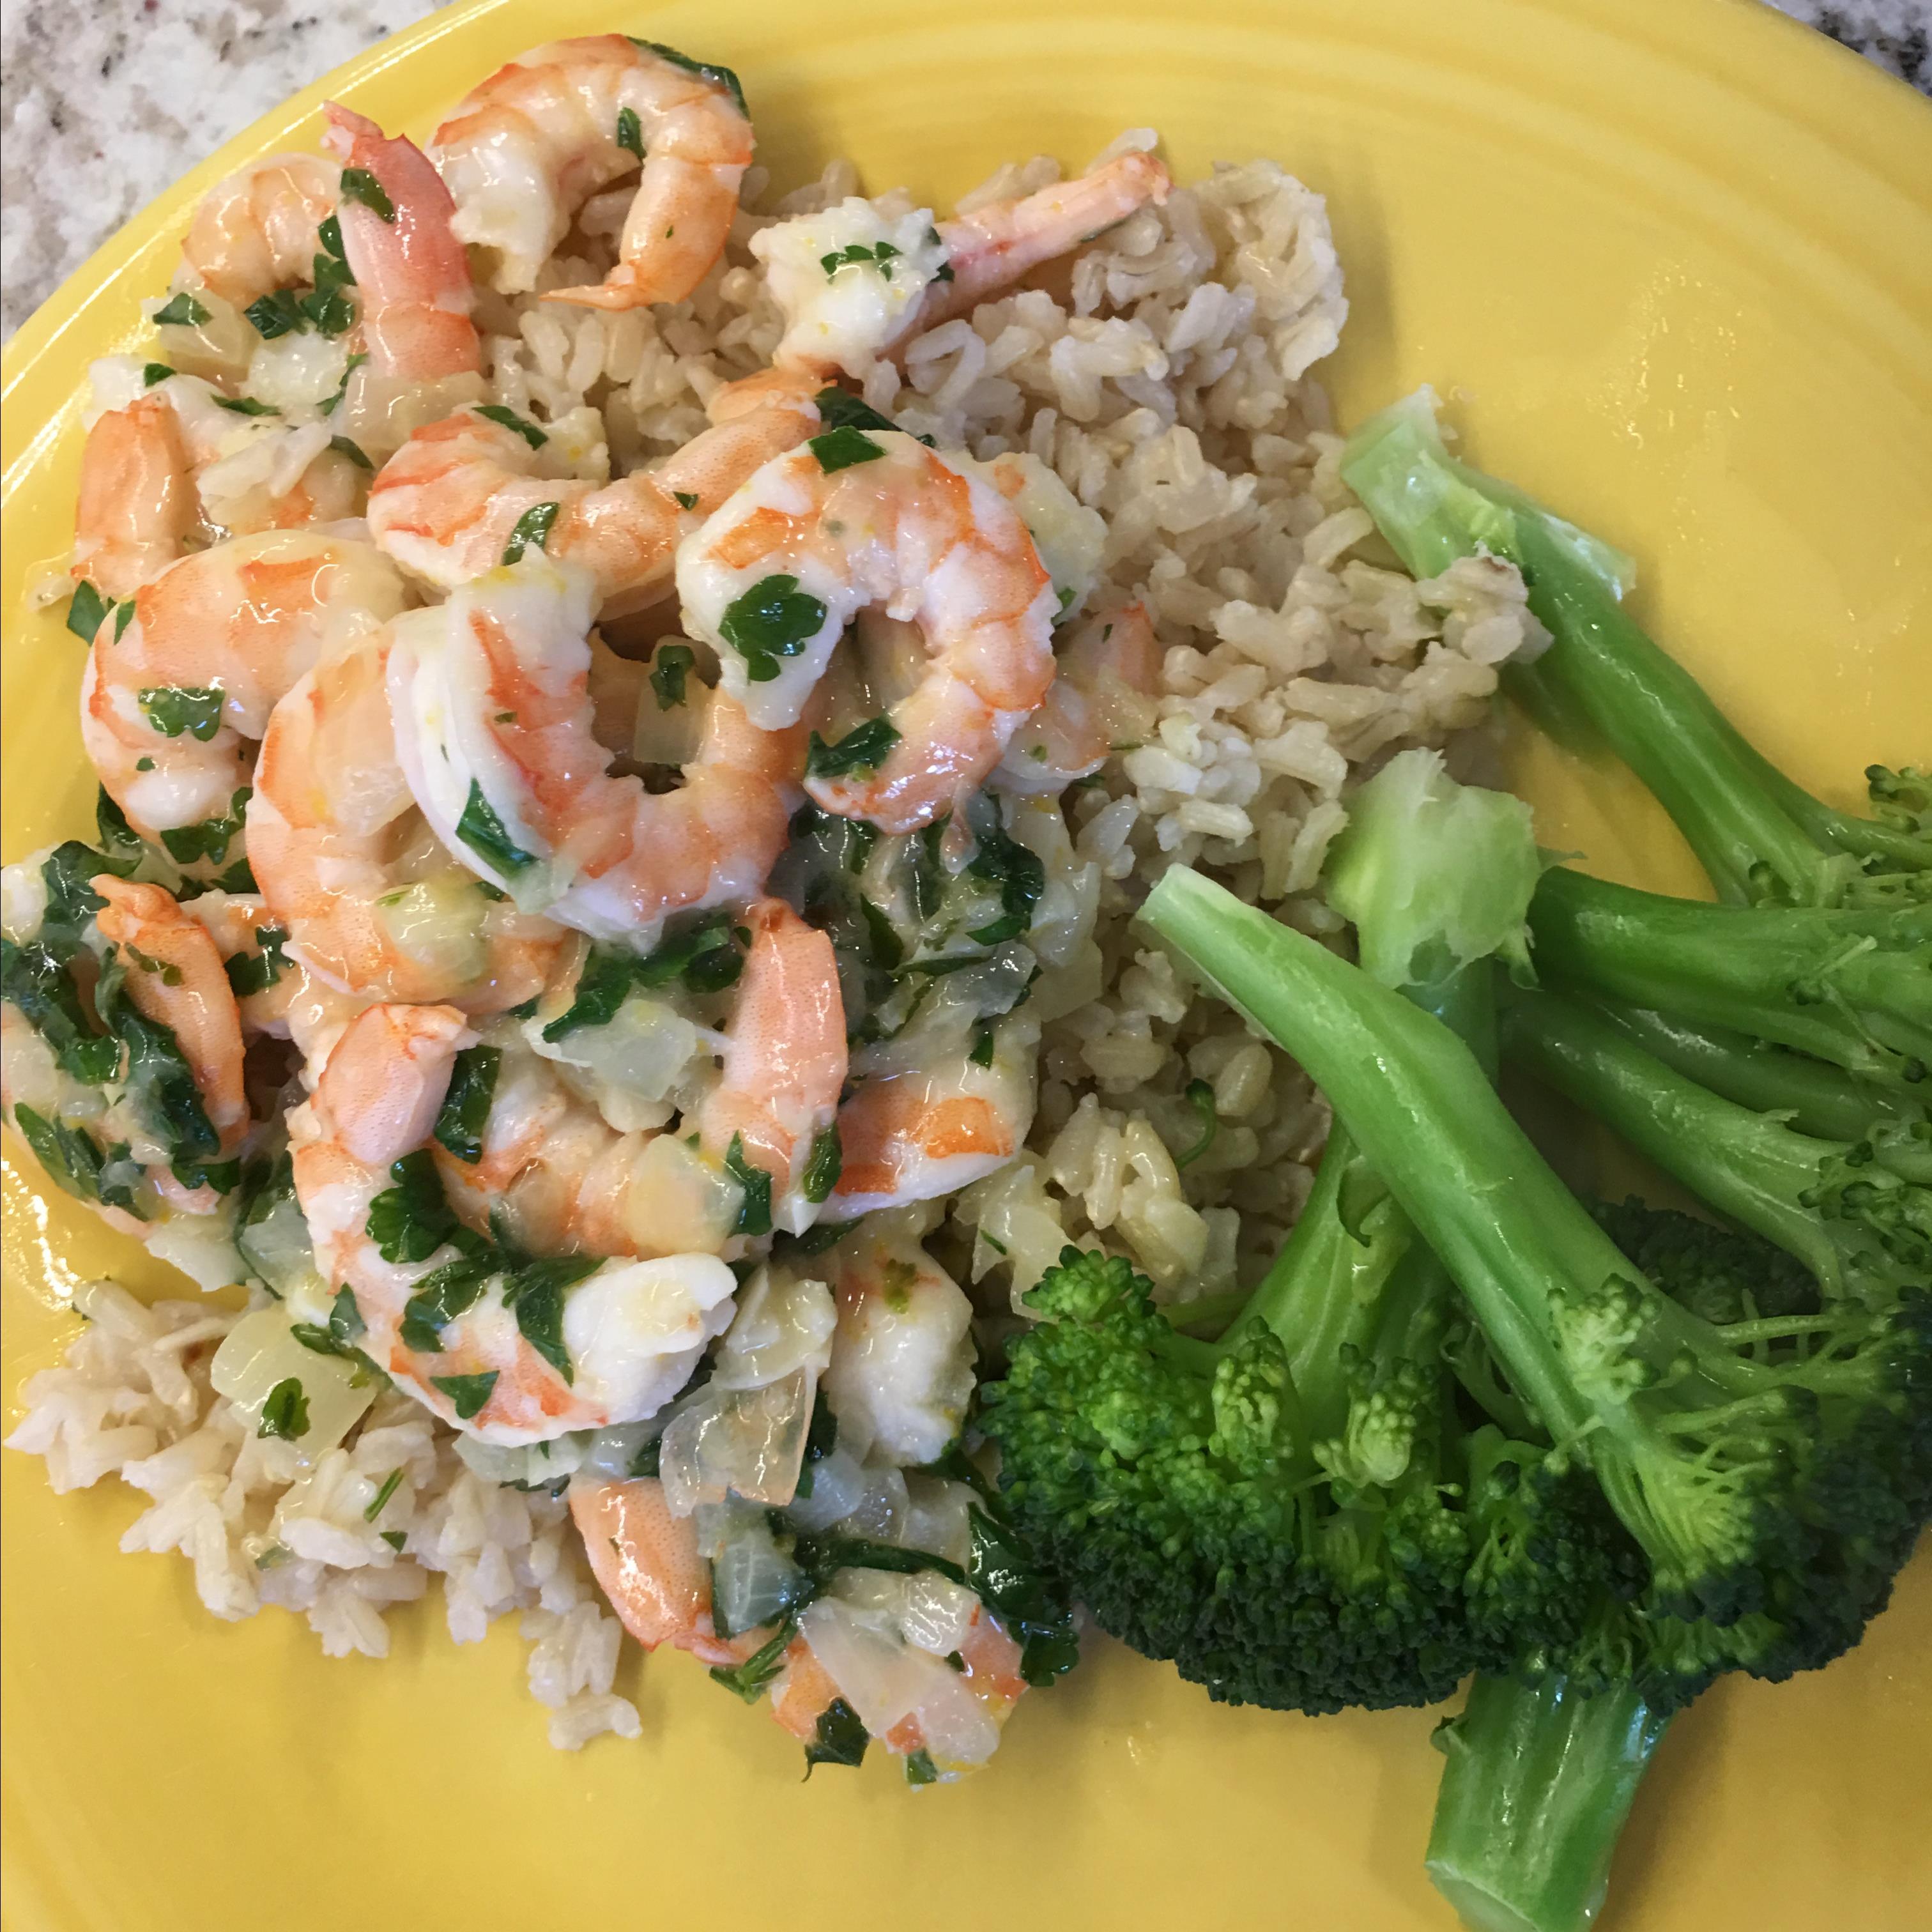 Lemony Shrimp over Brown Rice